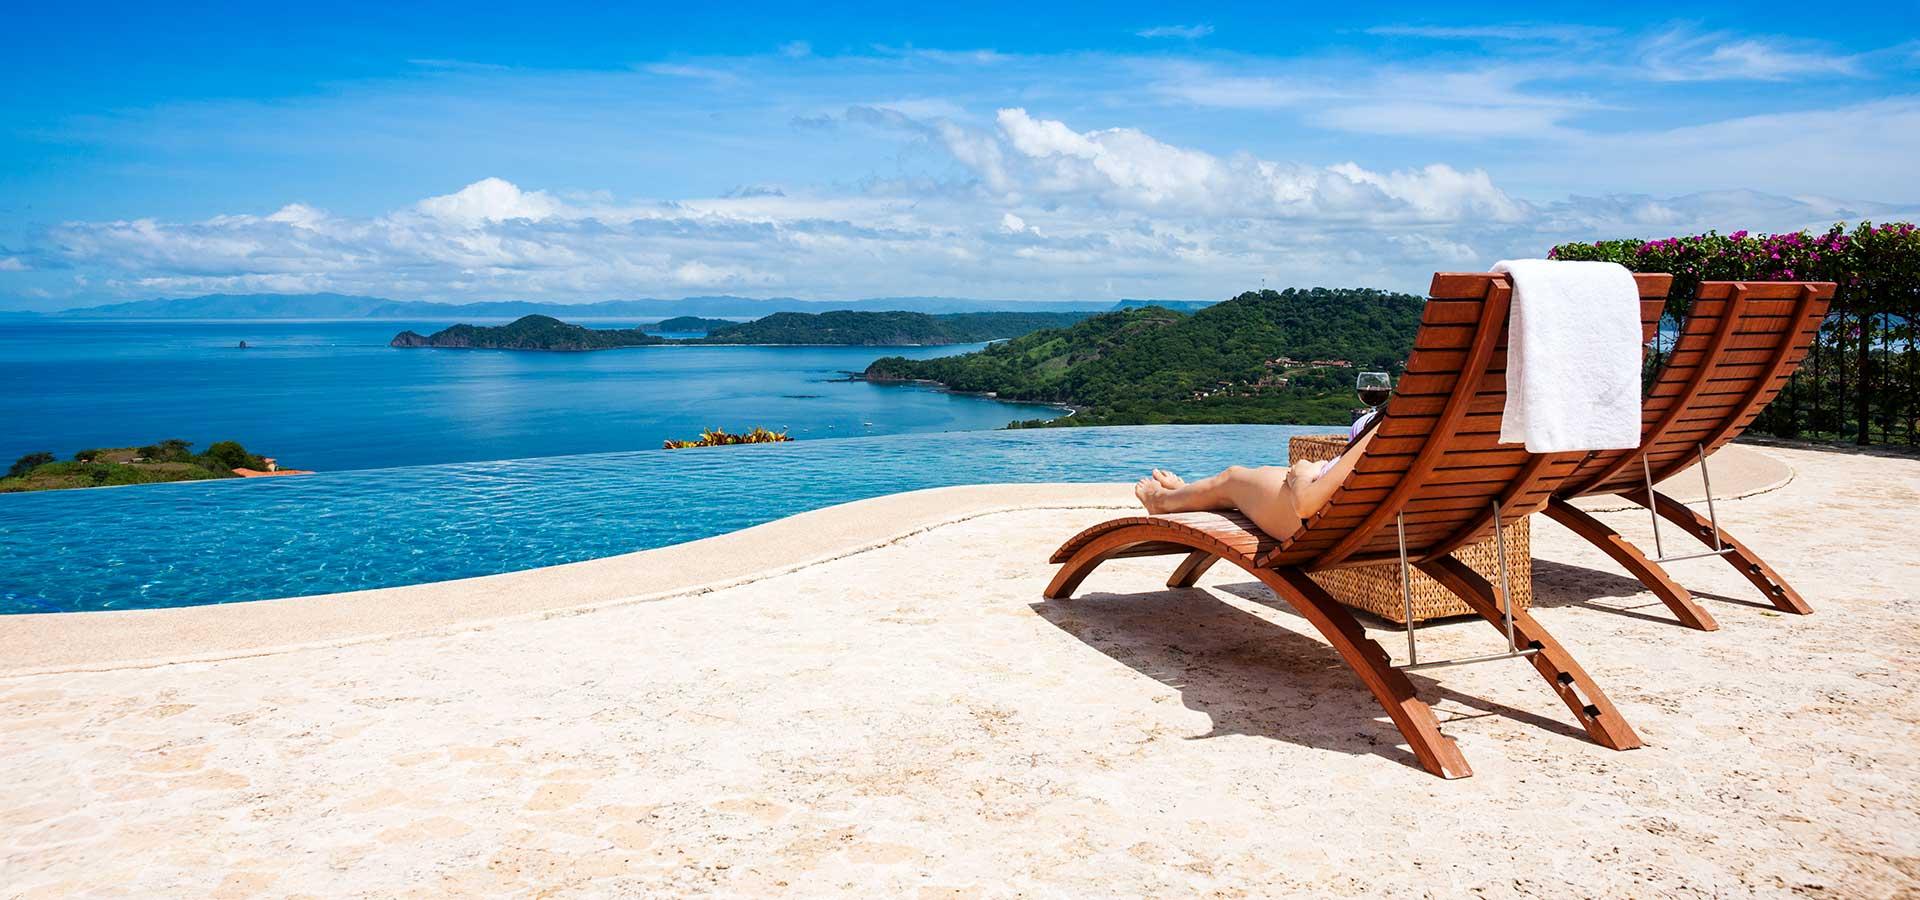 Experiencia a Costa Rica San Jose